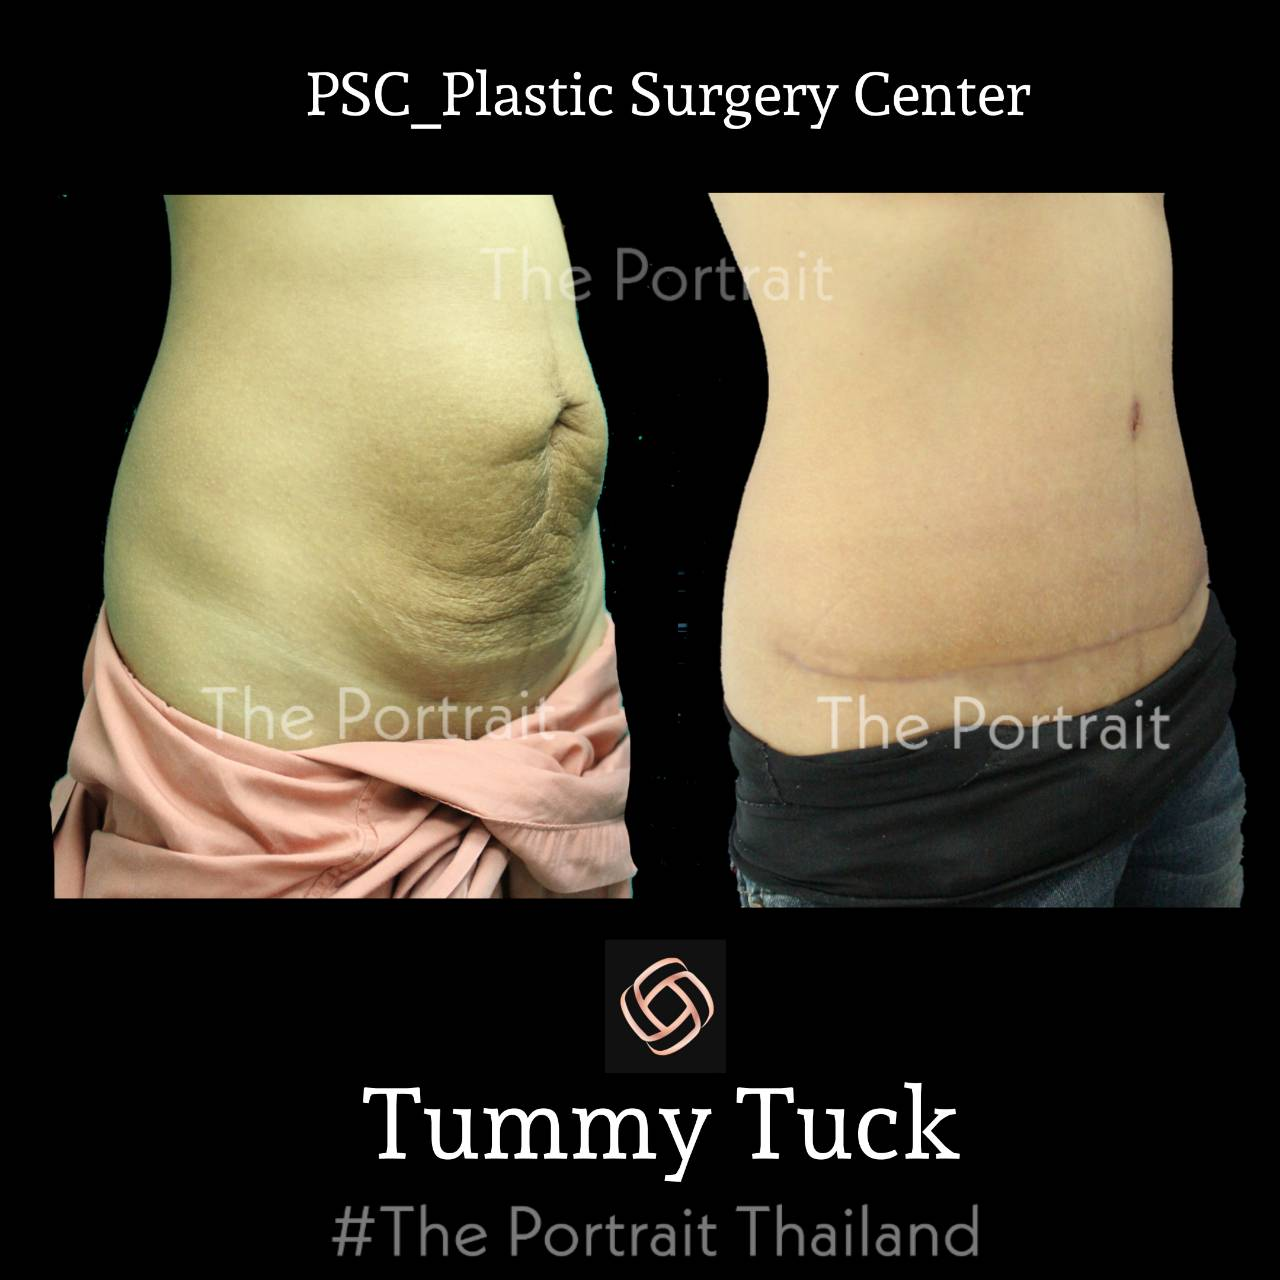 PSC 30 - abdominoplasty (ผ่าตัดกระชับหน้าท้อง)